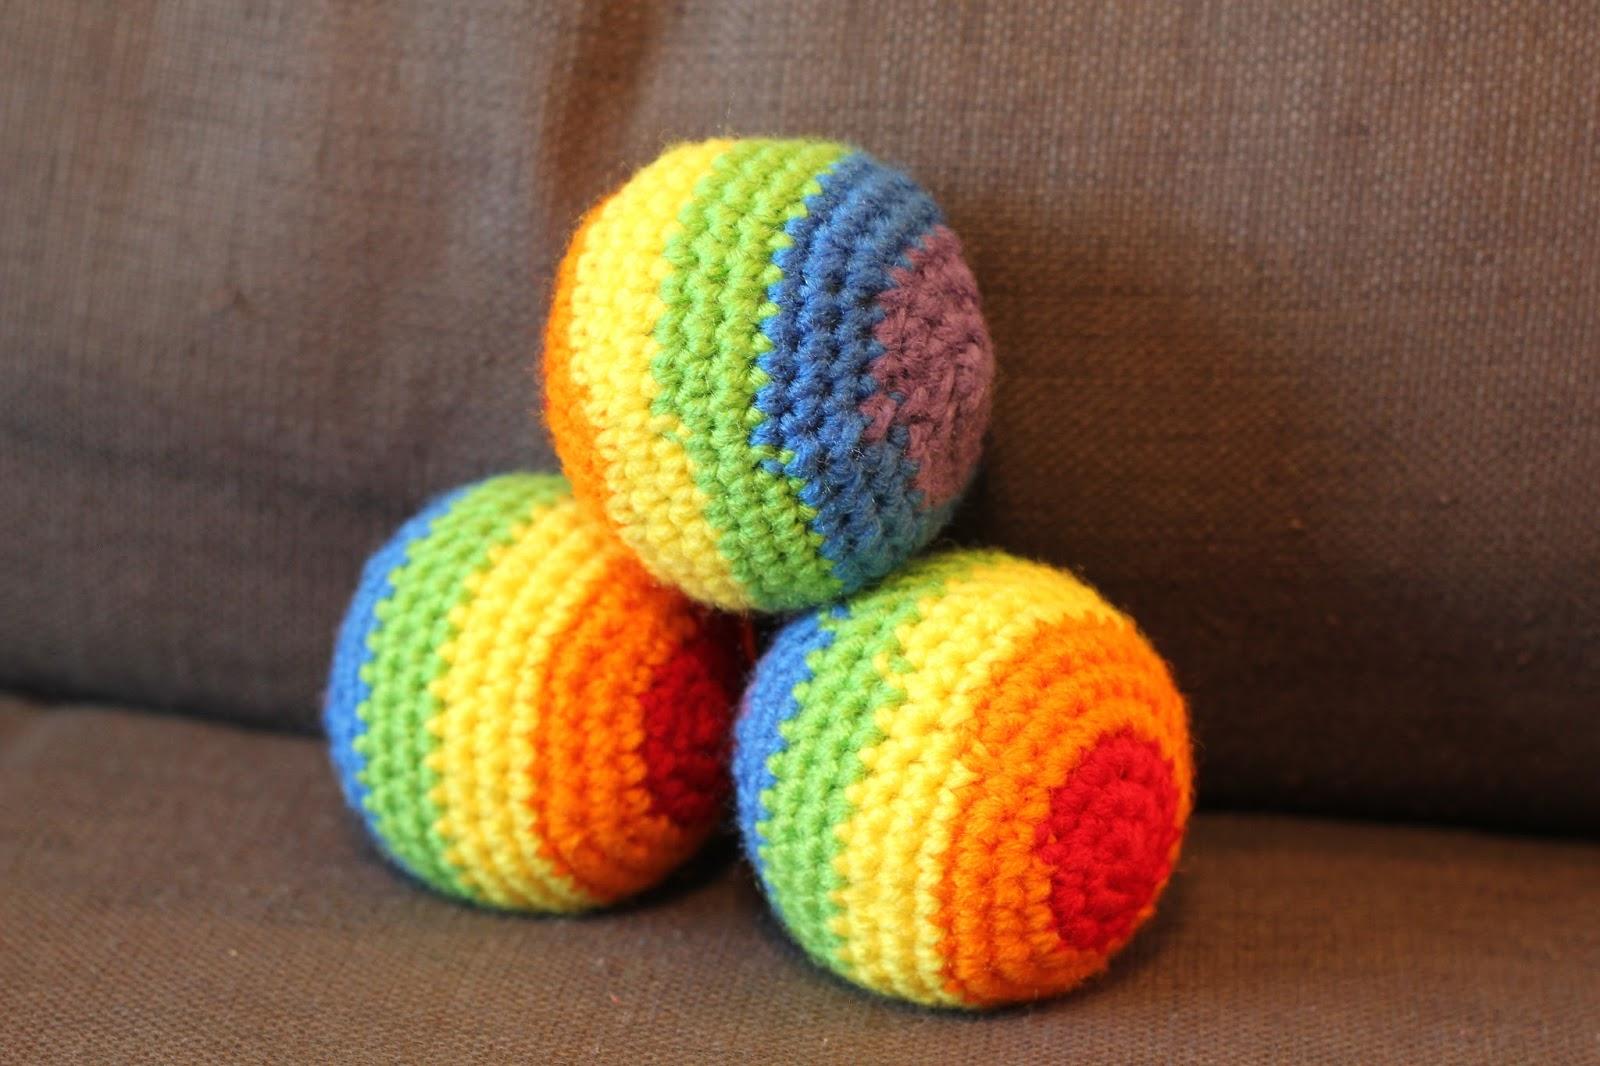 Crochet Sphere Pattern Free Crafting For My Sanity Crochet Rainbow Juggling Balls Free Pattern